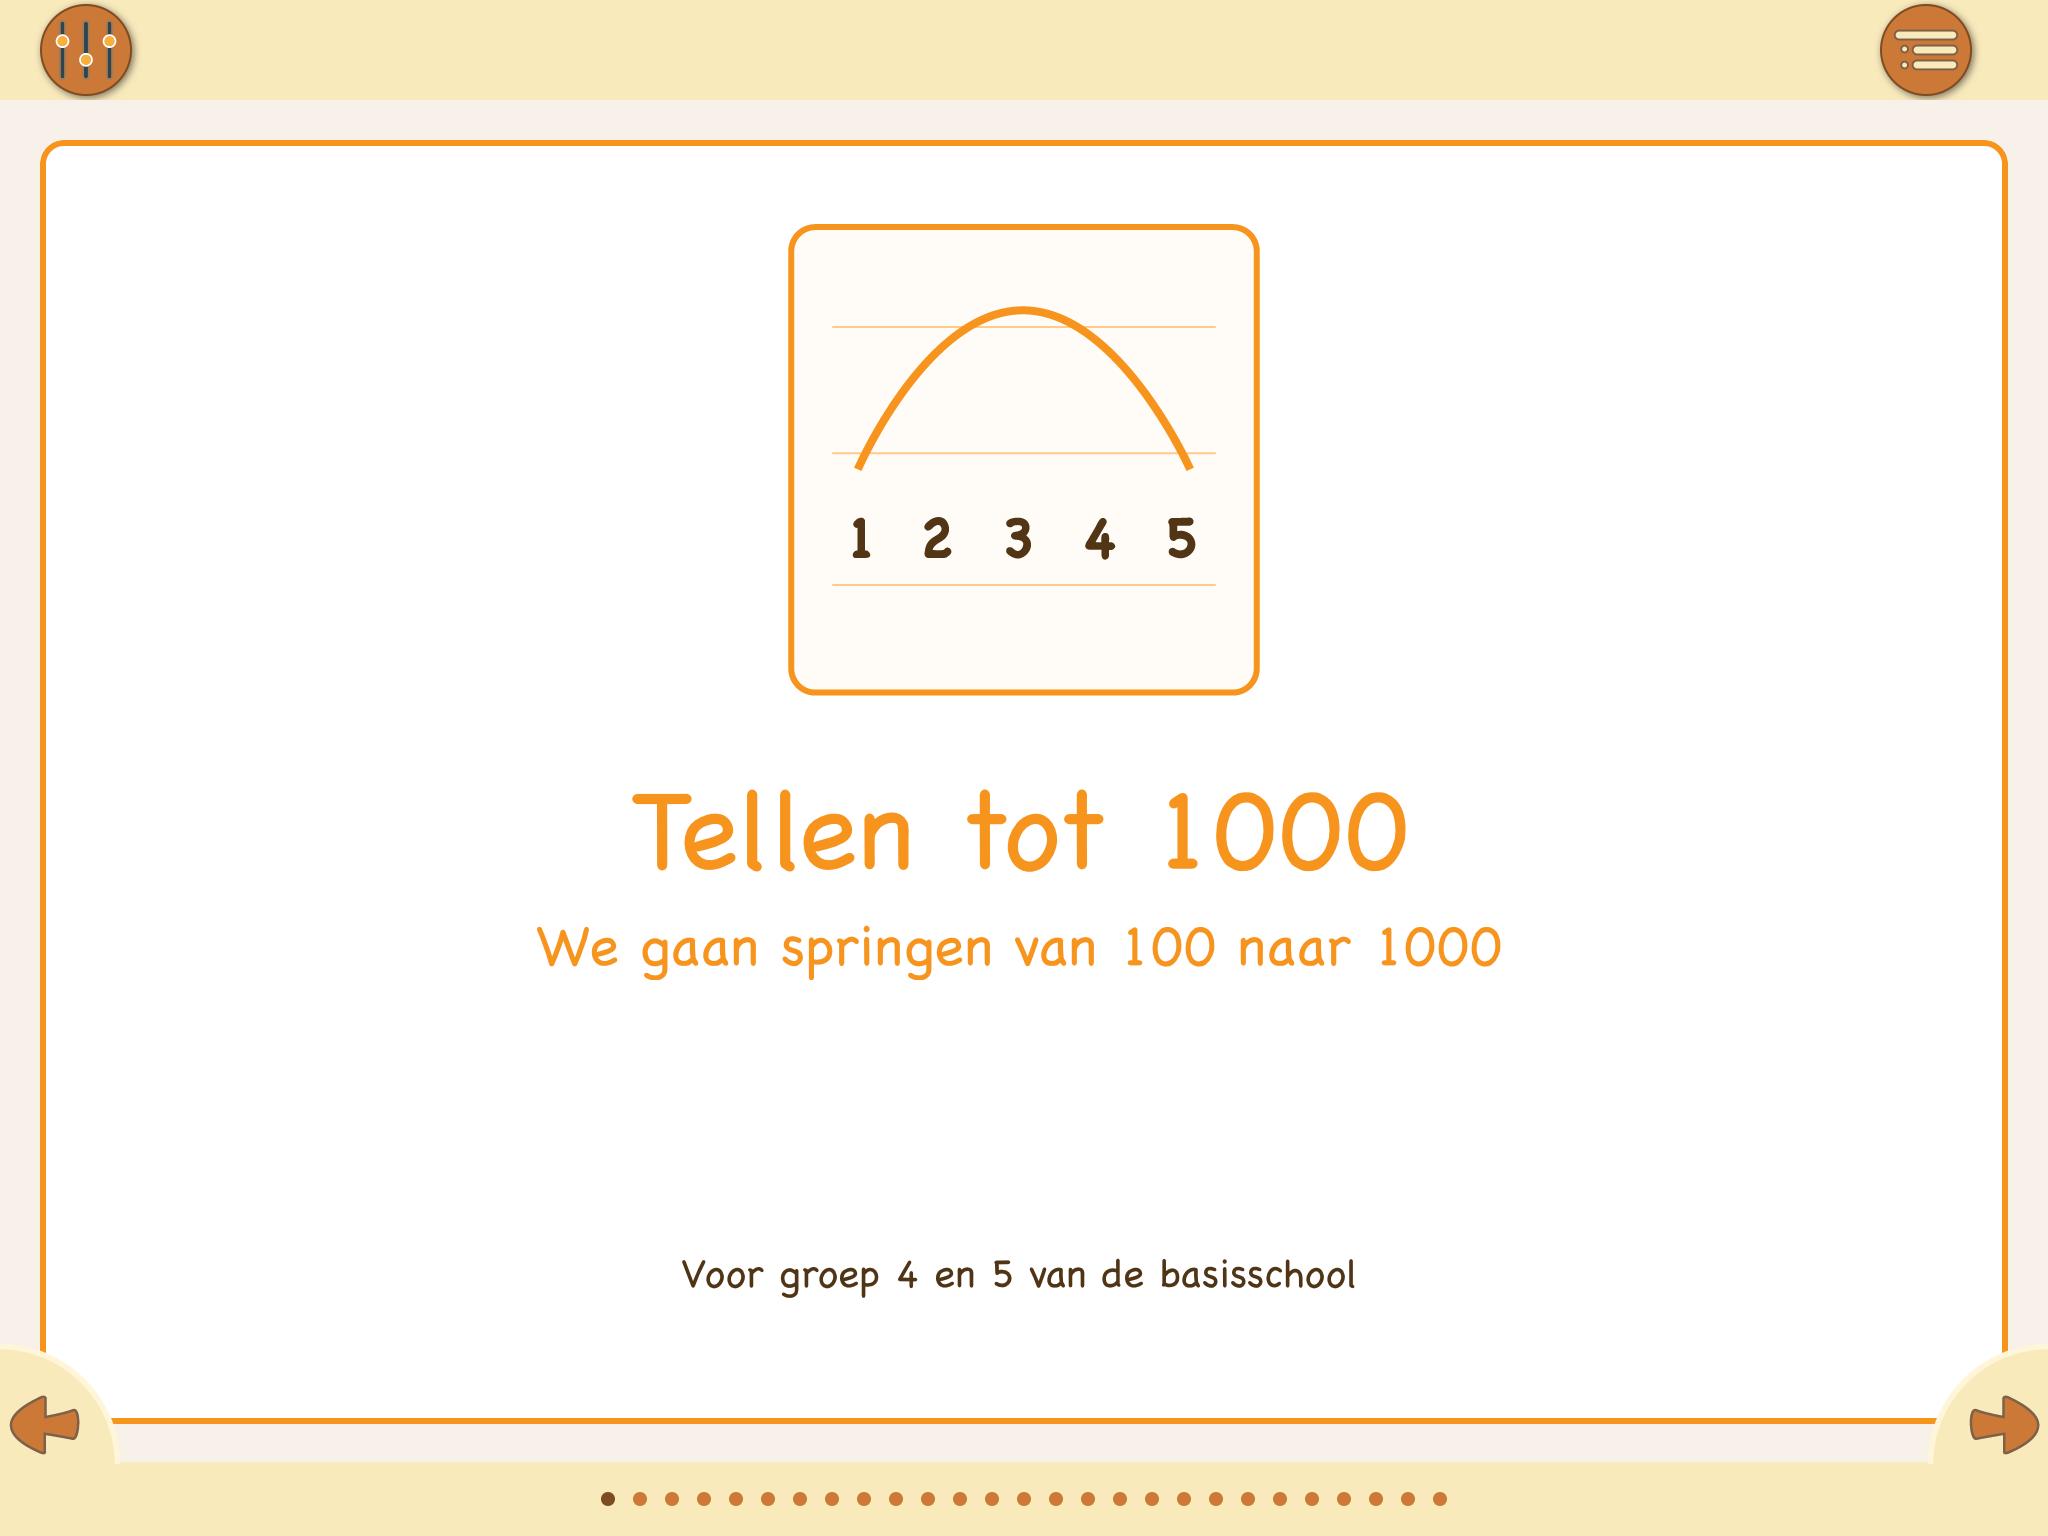 X002-P-nl-01